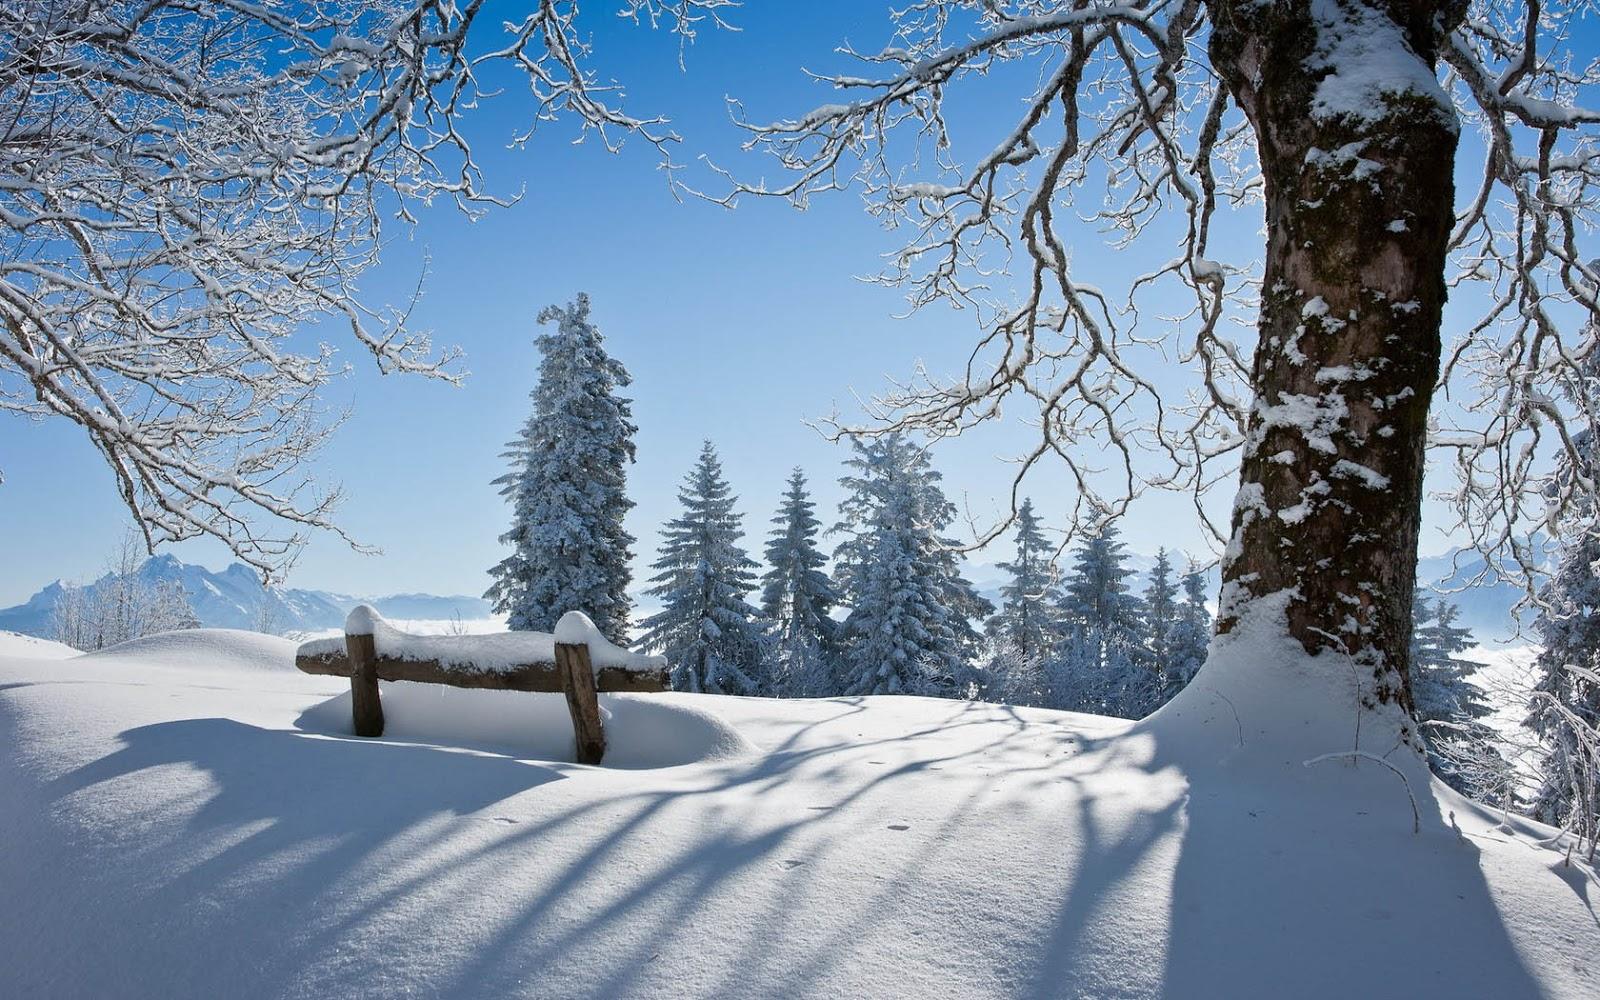 winter 108 hintergrundbild gratis - photo #38